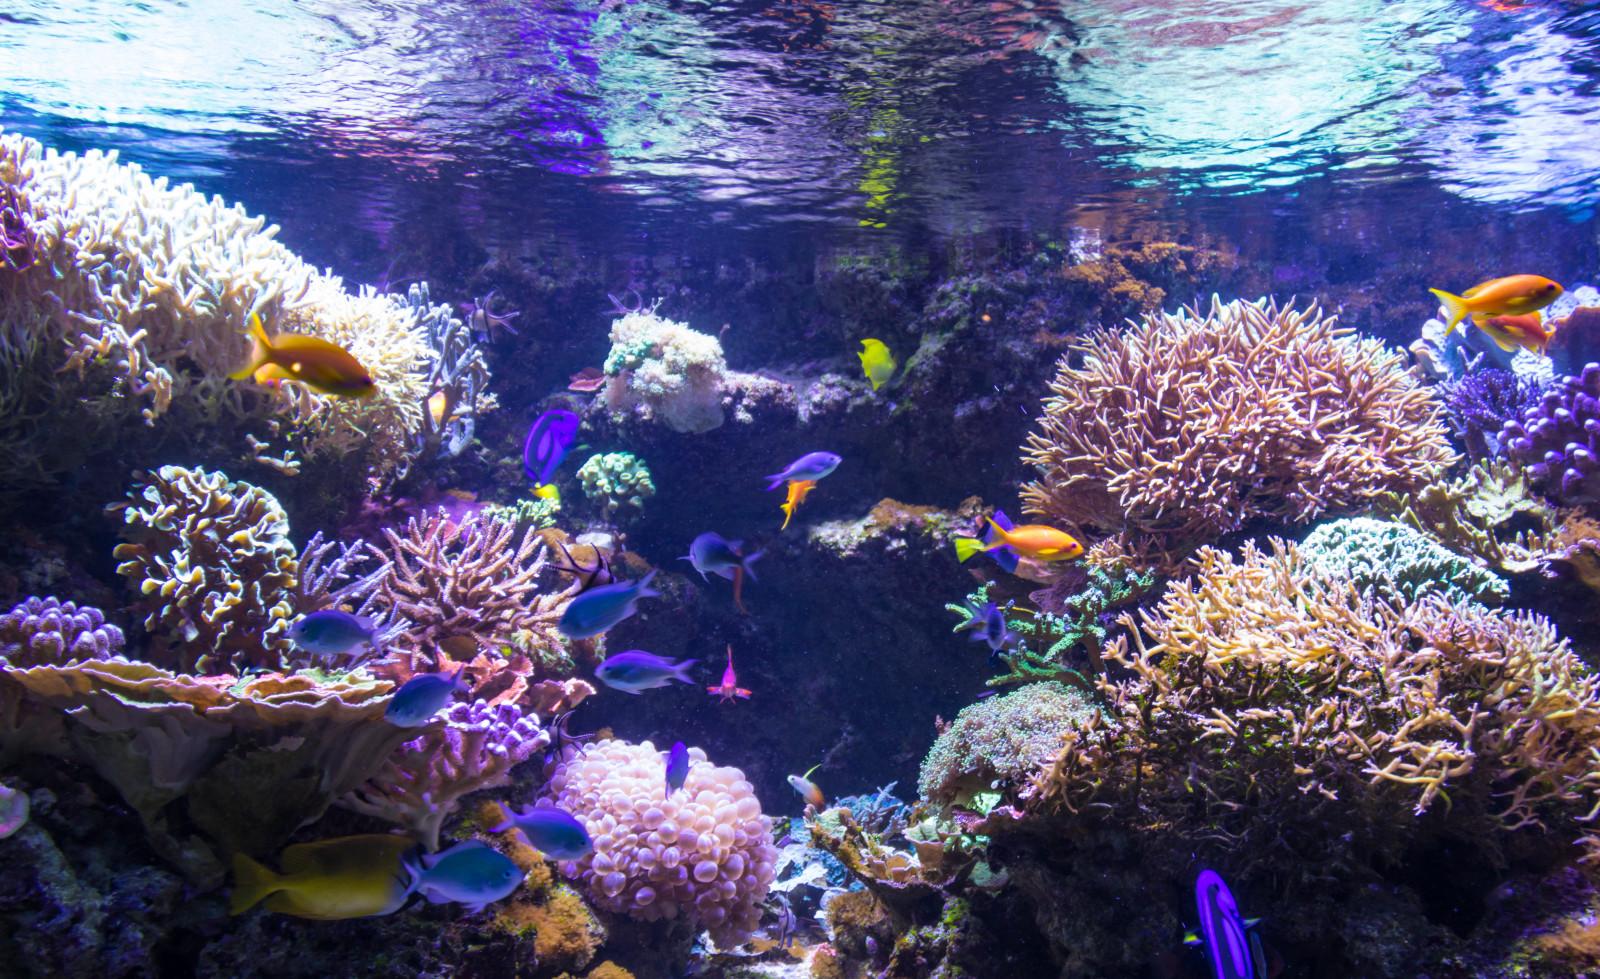 fond d 39 cran poisson sous marin r cif de corail aquarium la biologie malm husslott malmo. Black Bedroom Furniture Sets. Home Design Ideas